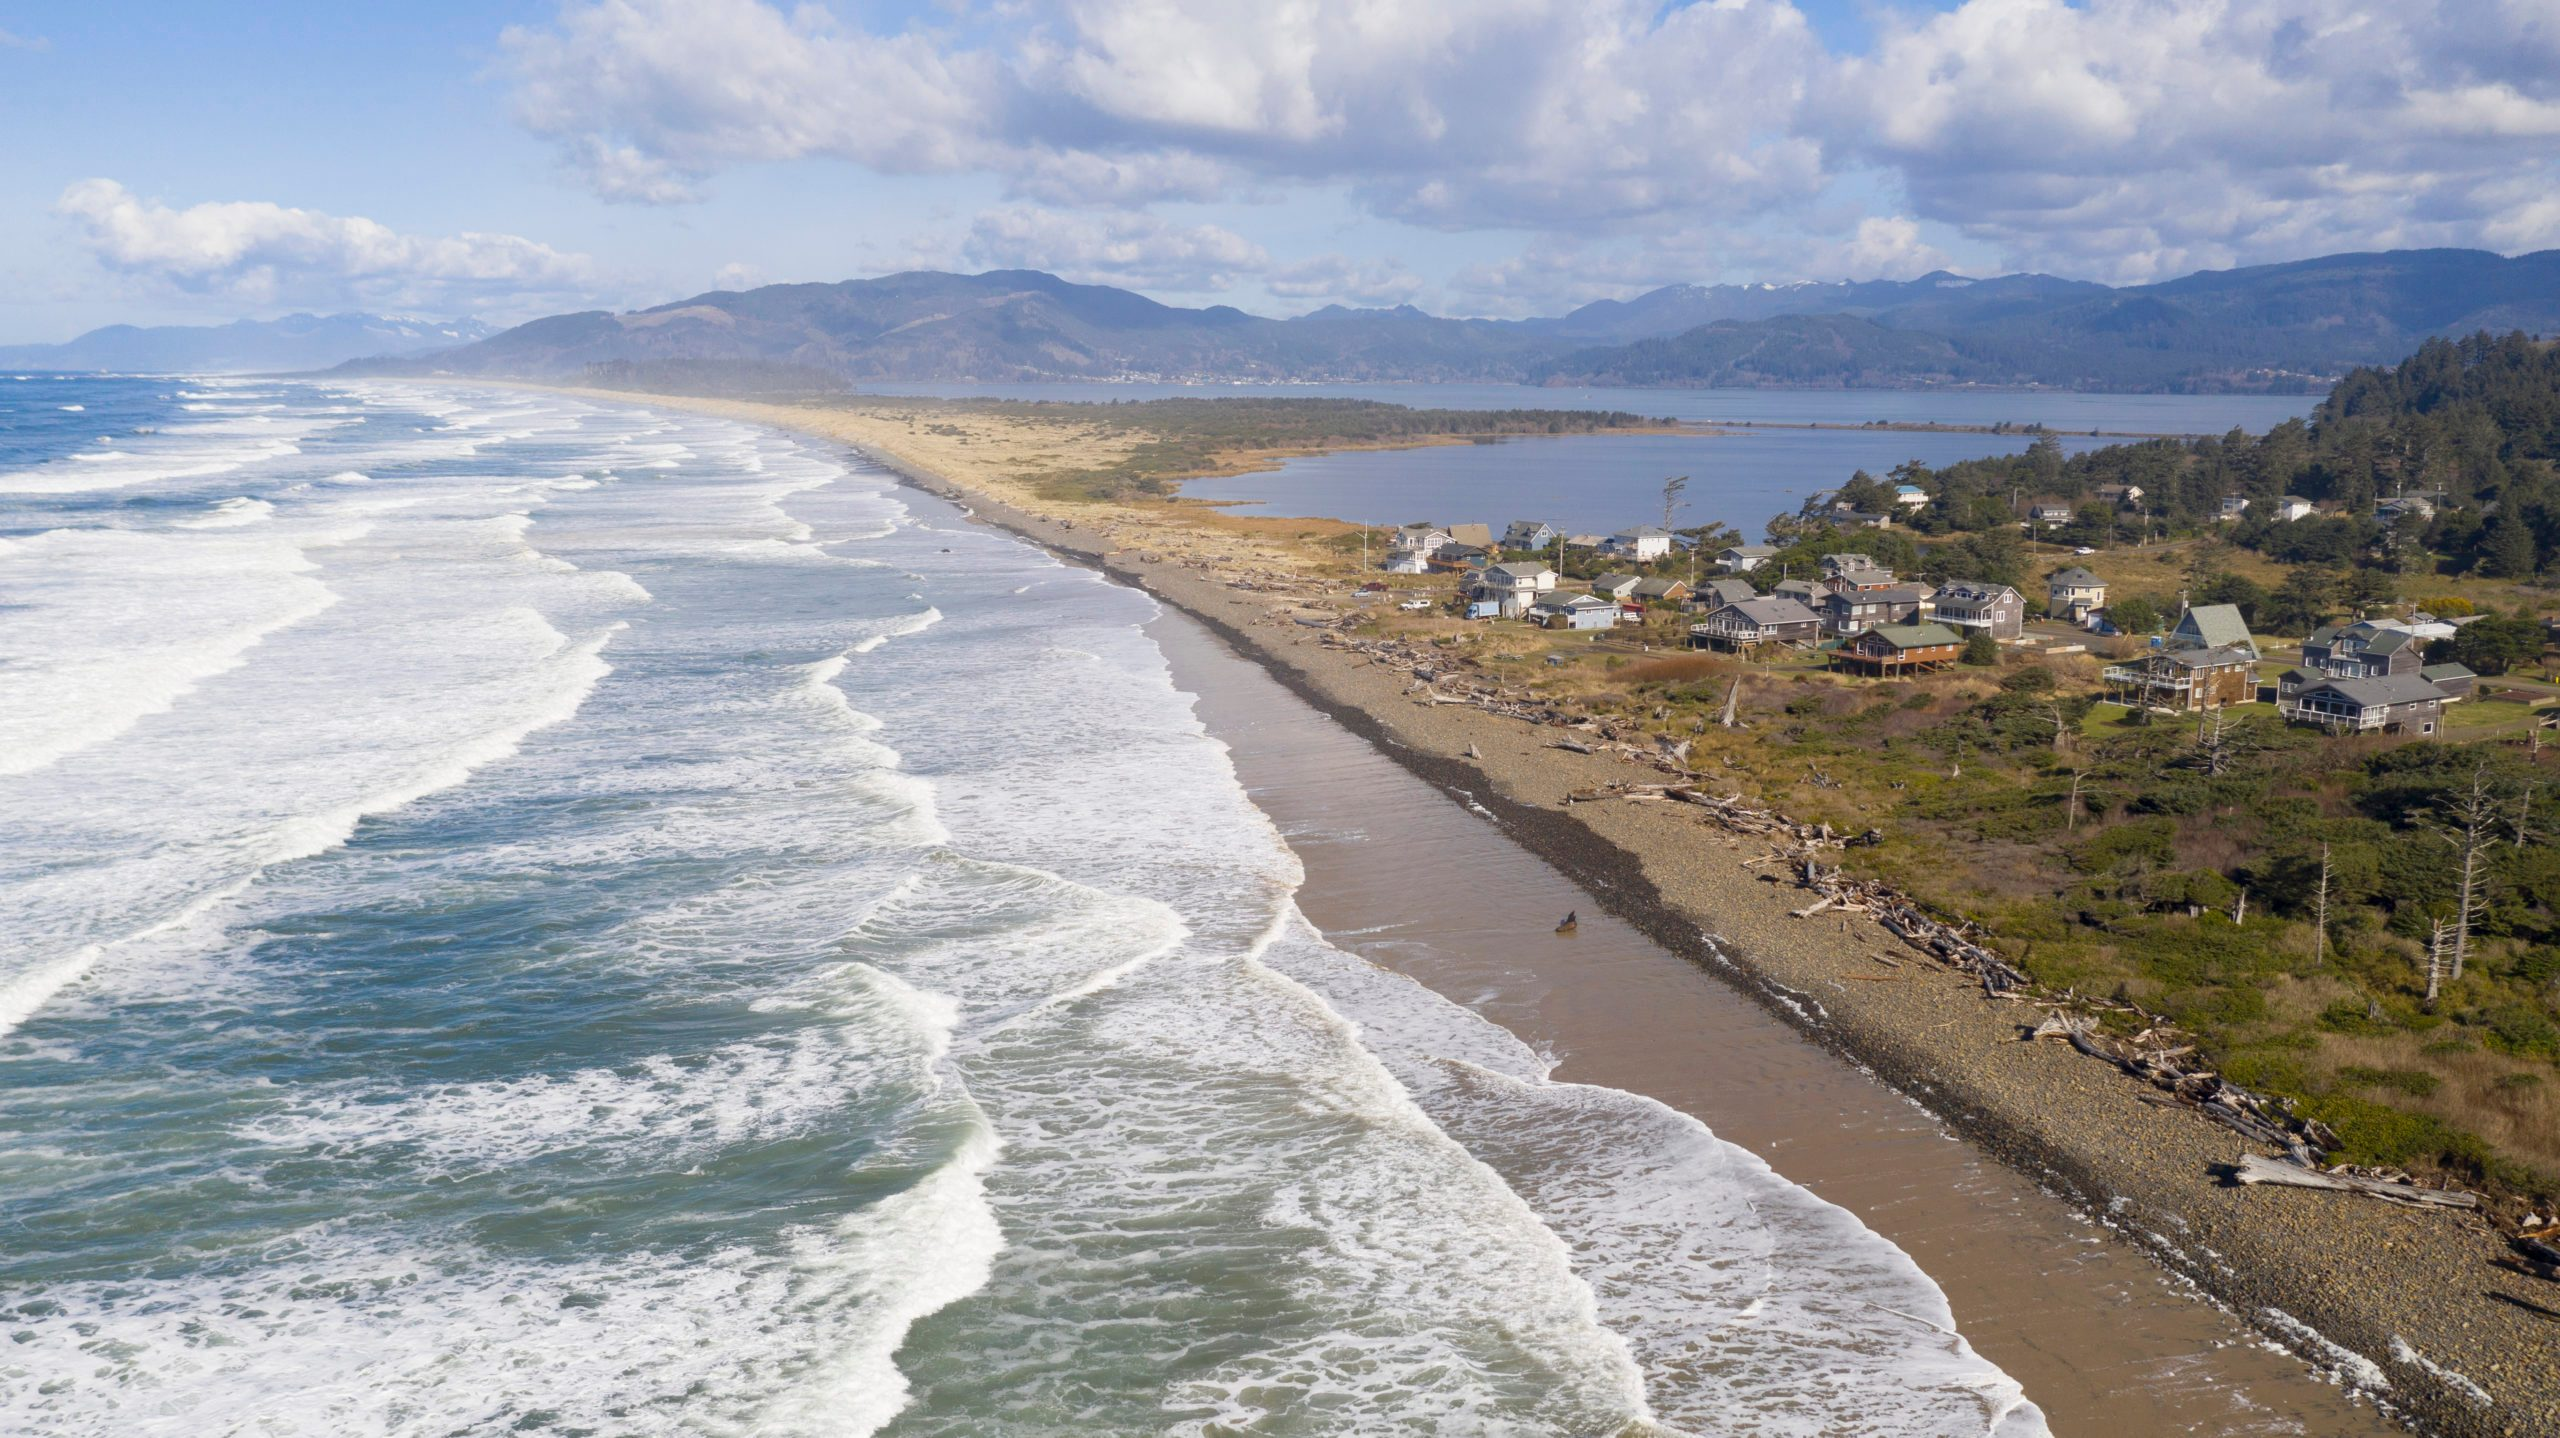 Aerial Perspective over Pacific Coast Beach Bayocean Peninsula Park